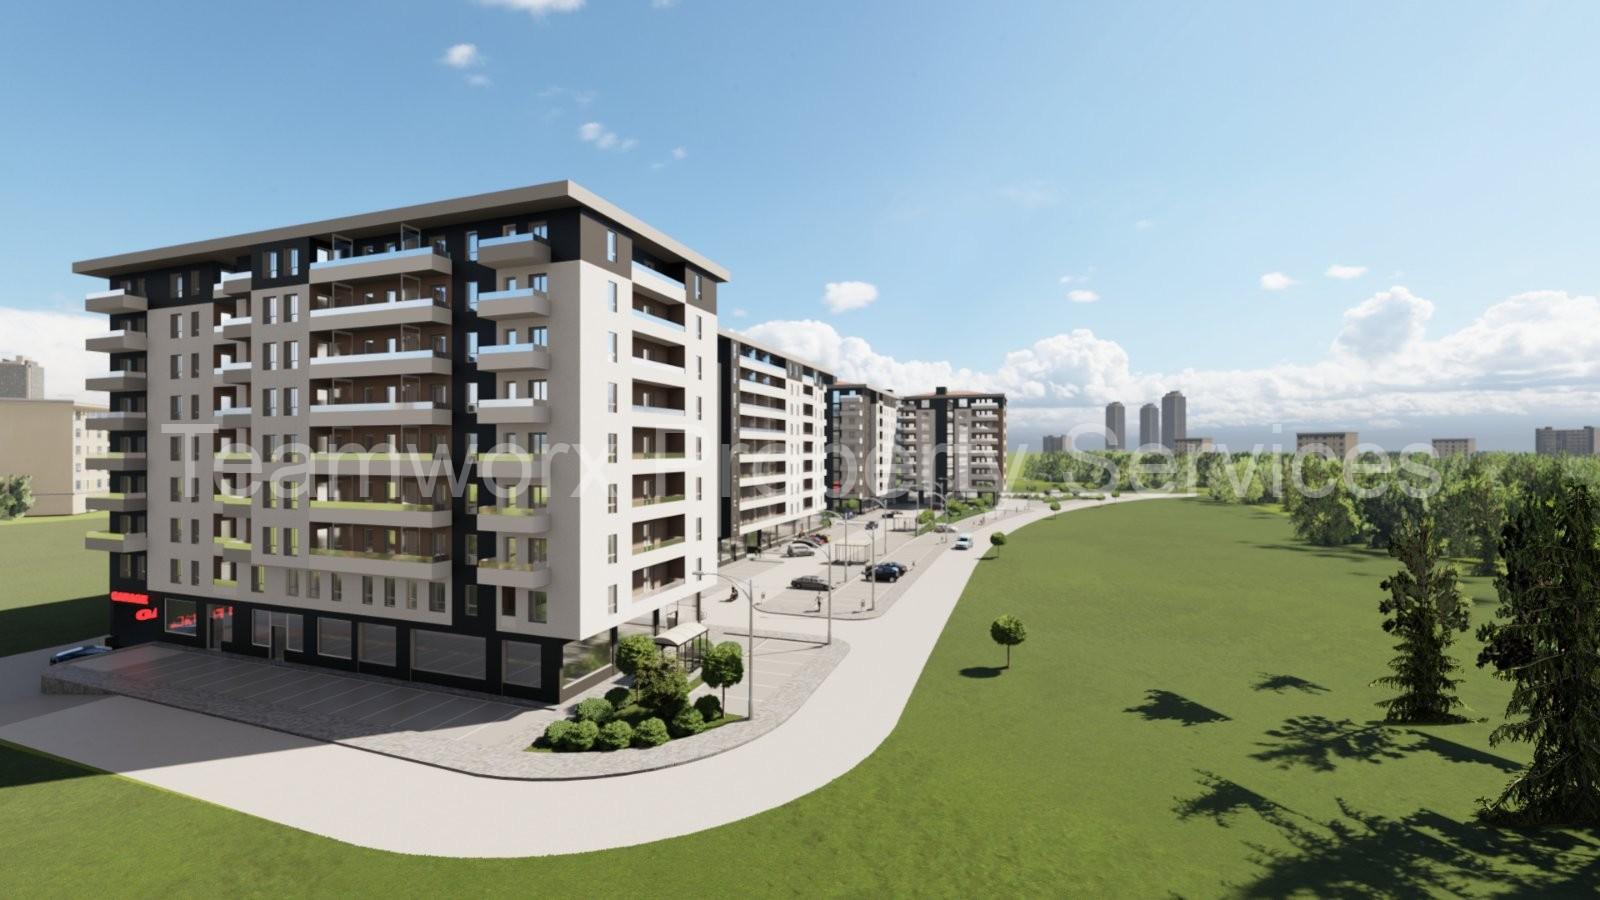 1125 sq/m Plot For sale in Agios Tychonas